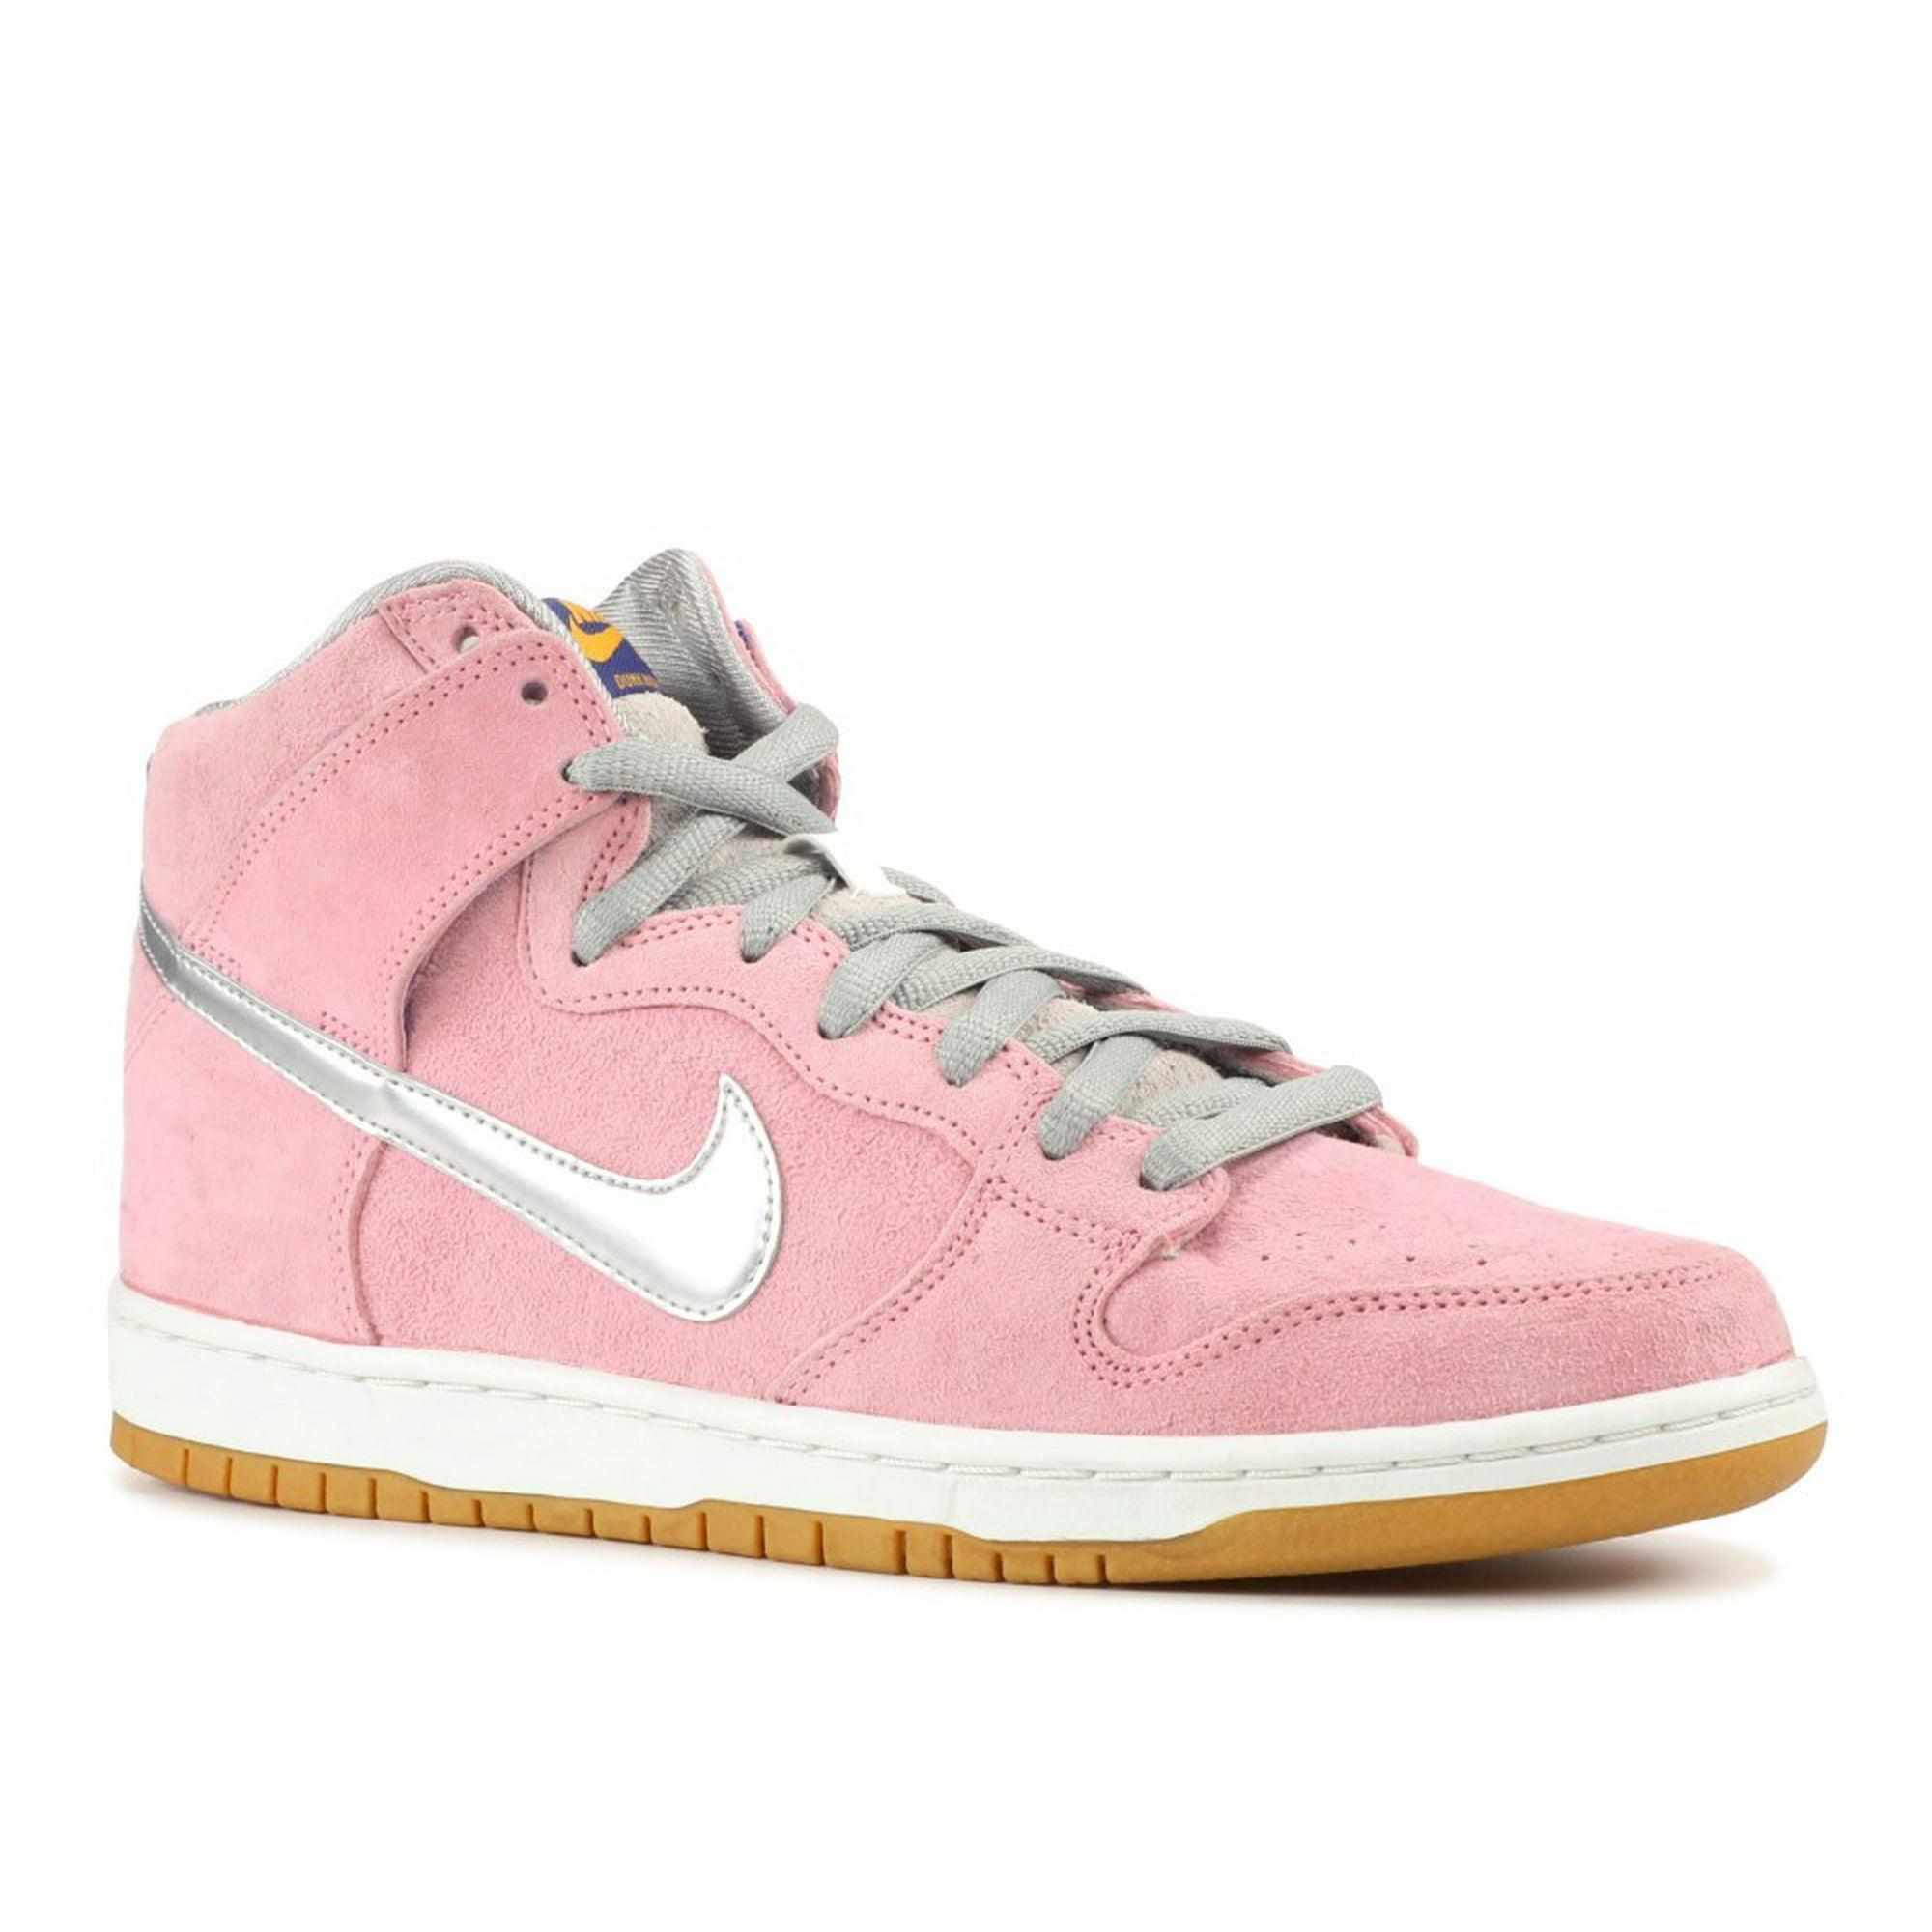 the best attitude a7352 8b5fa Nike - Men - Dunk High Pro Premium Sb  Concepts When Pigs Fly  - 554673-610  - Size 10   Walmart Canada